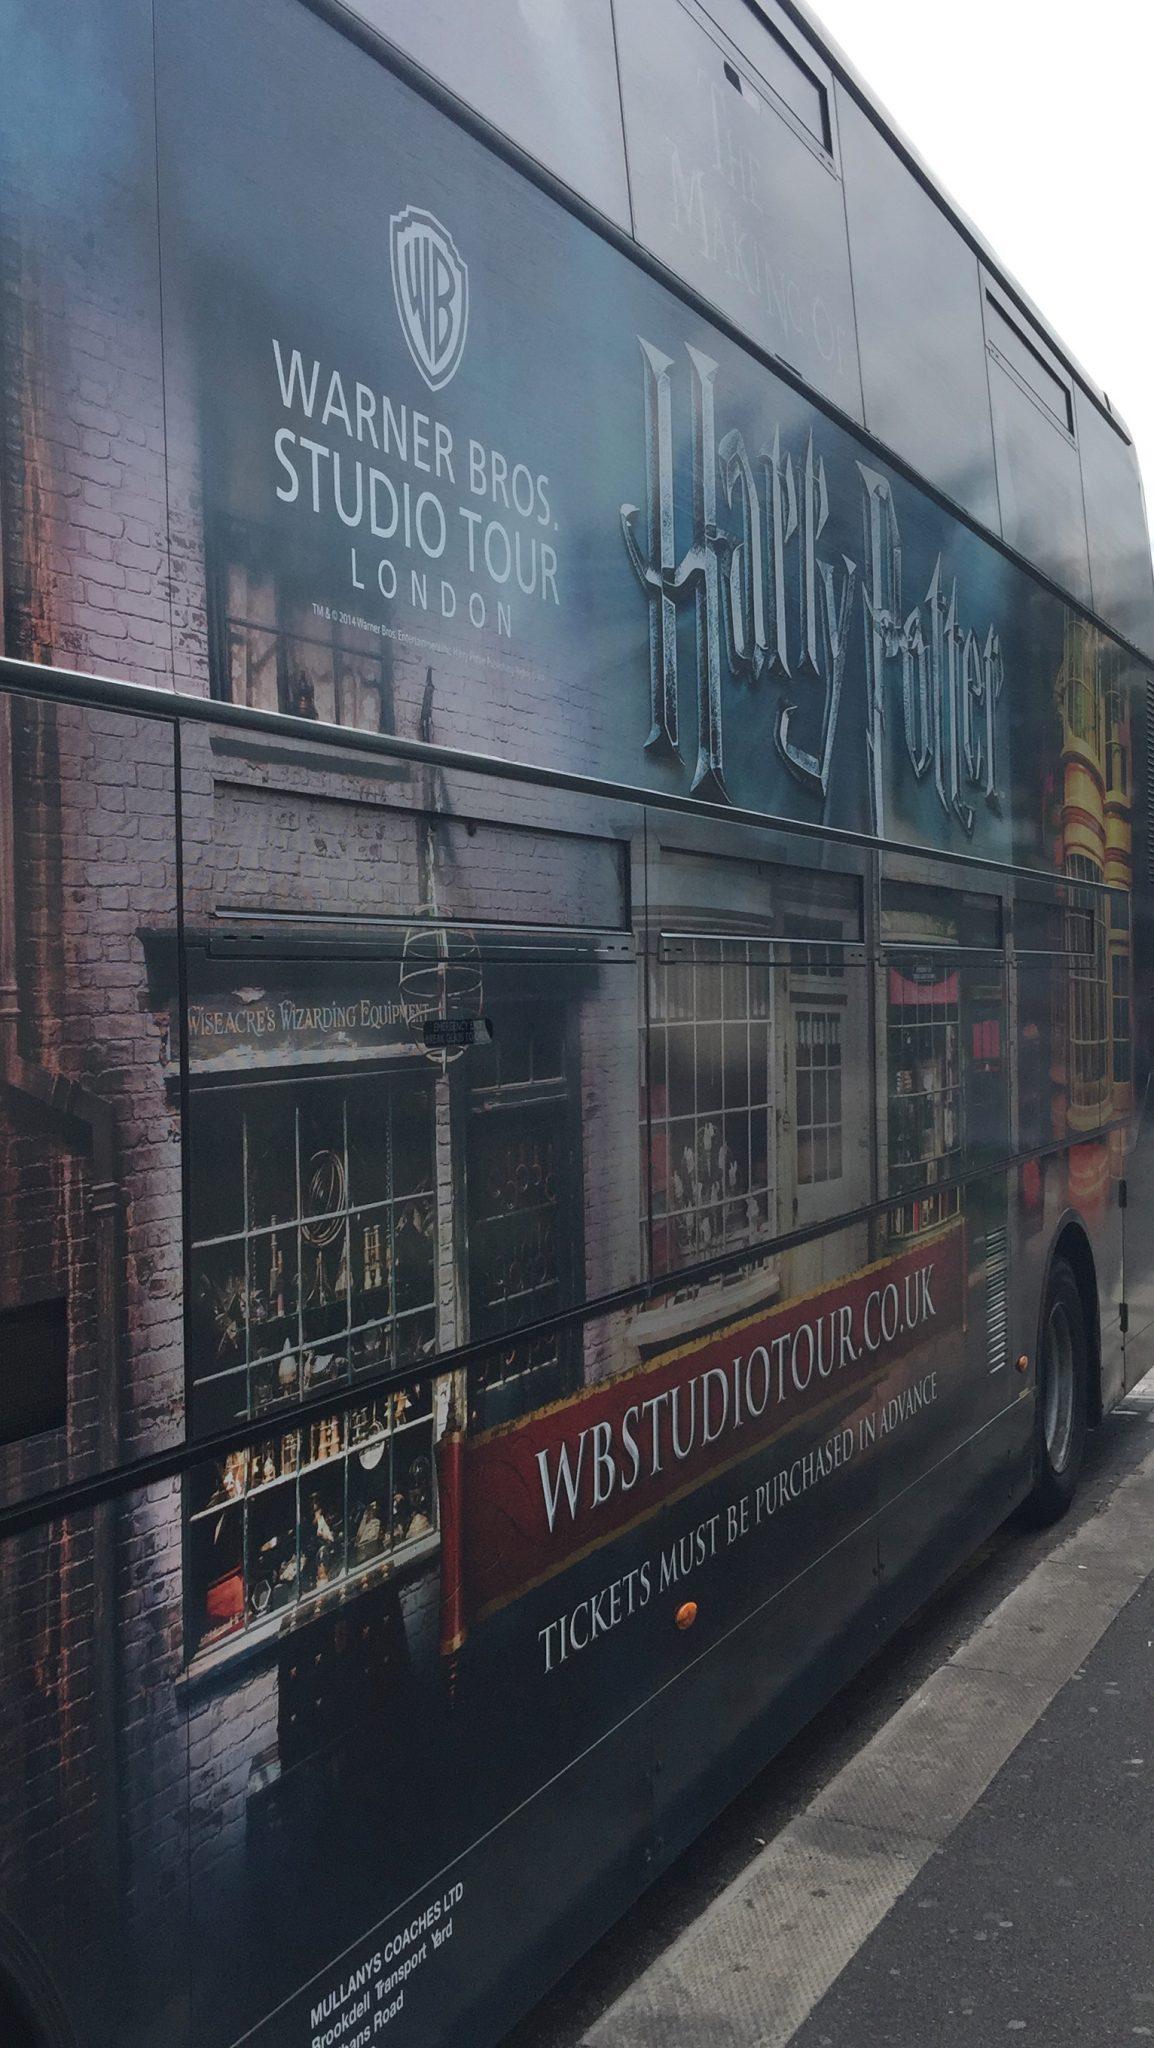 Visiting the Harry Potter Warner Bros Studio Tour, London